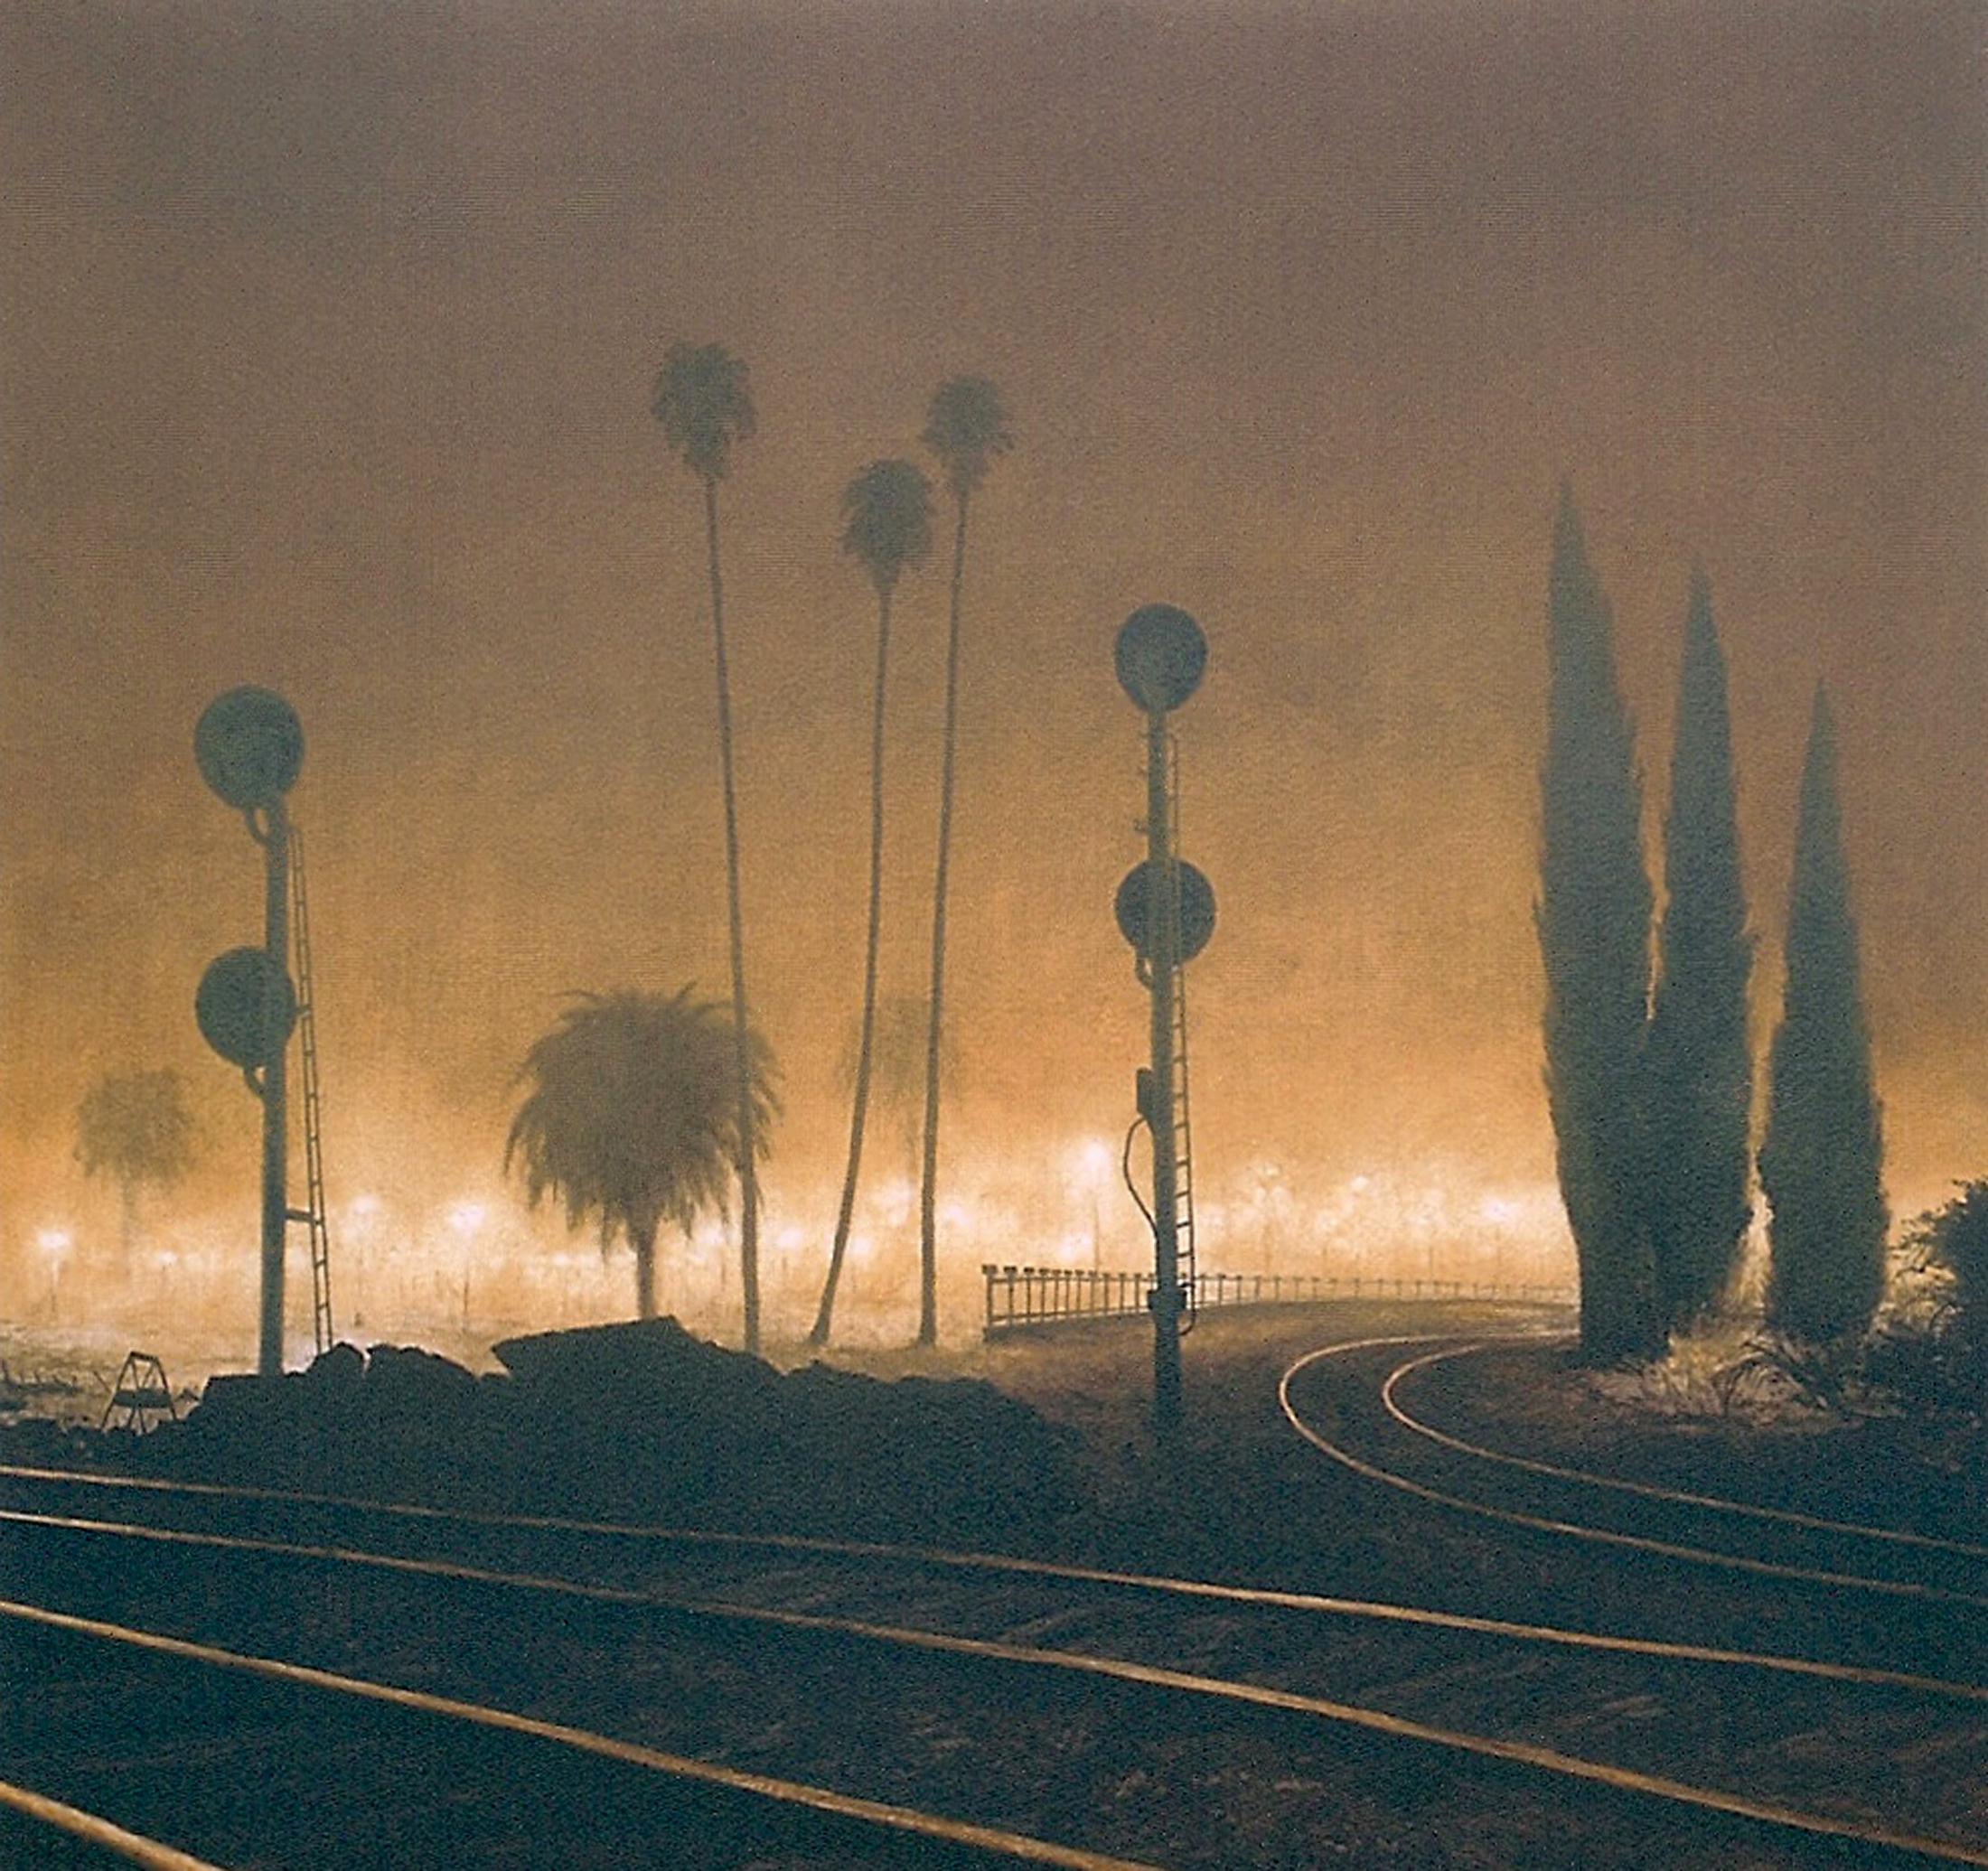 Davis Train Depot, Foggy Night.